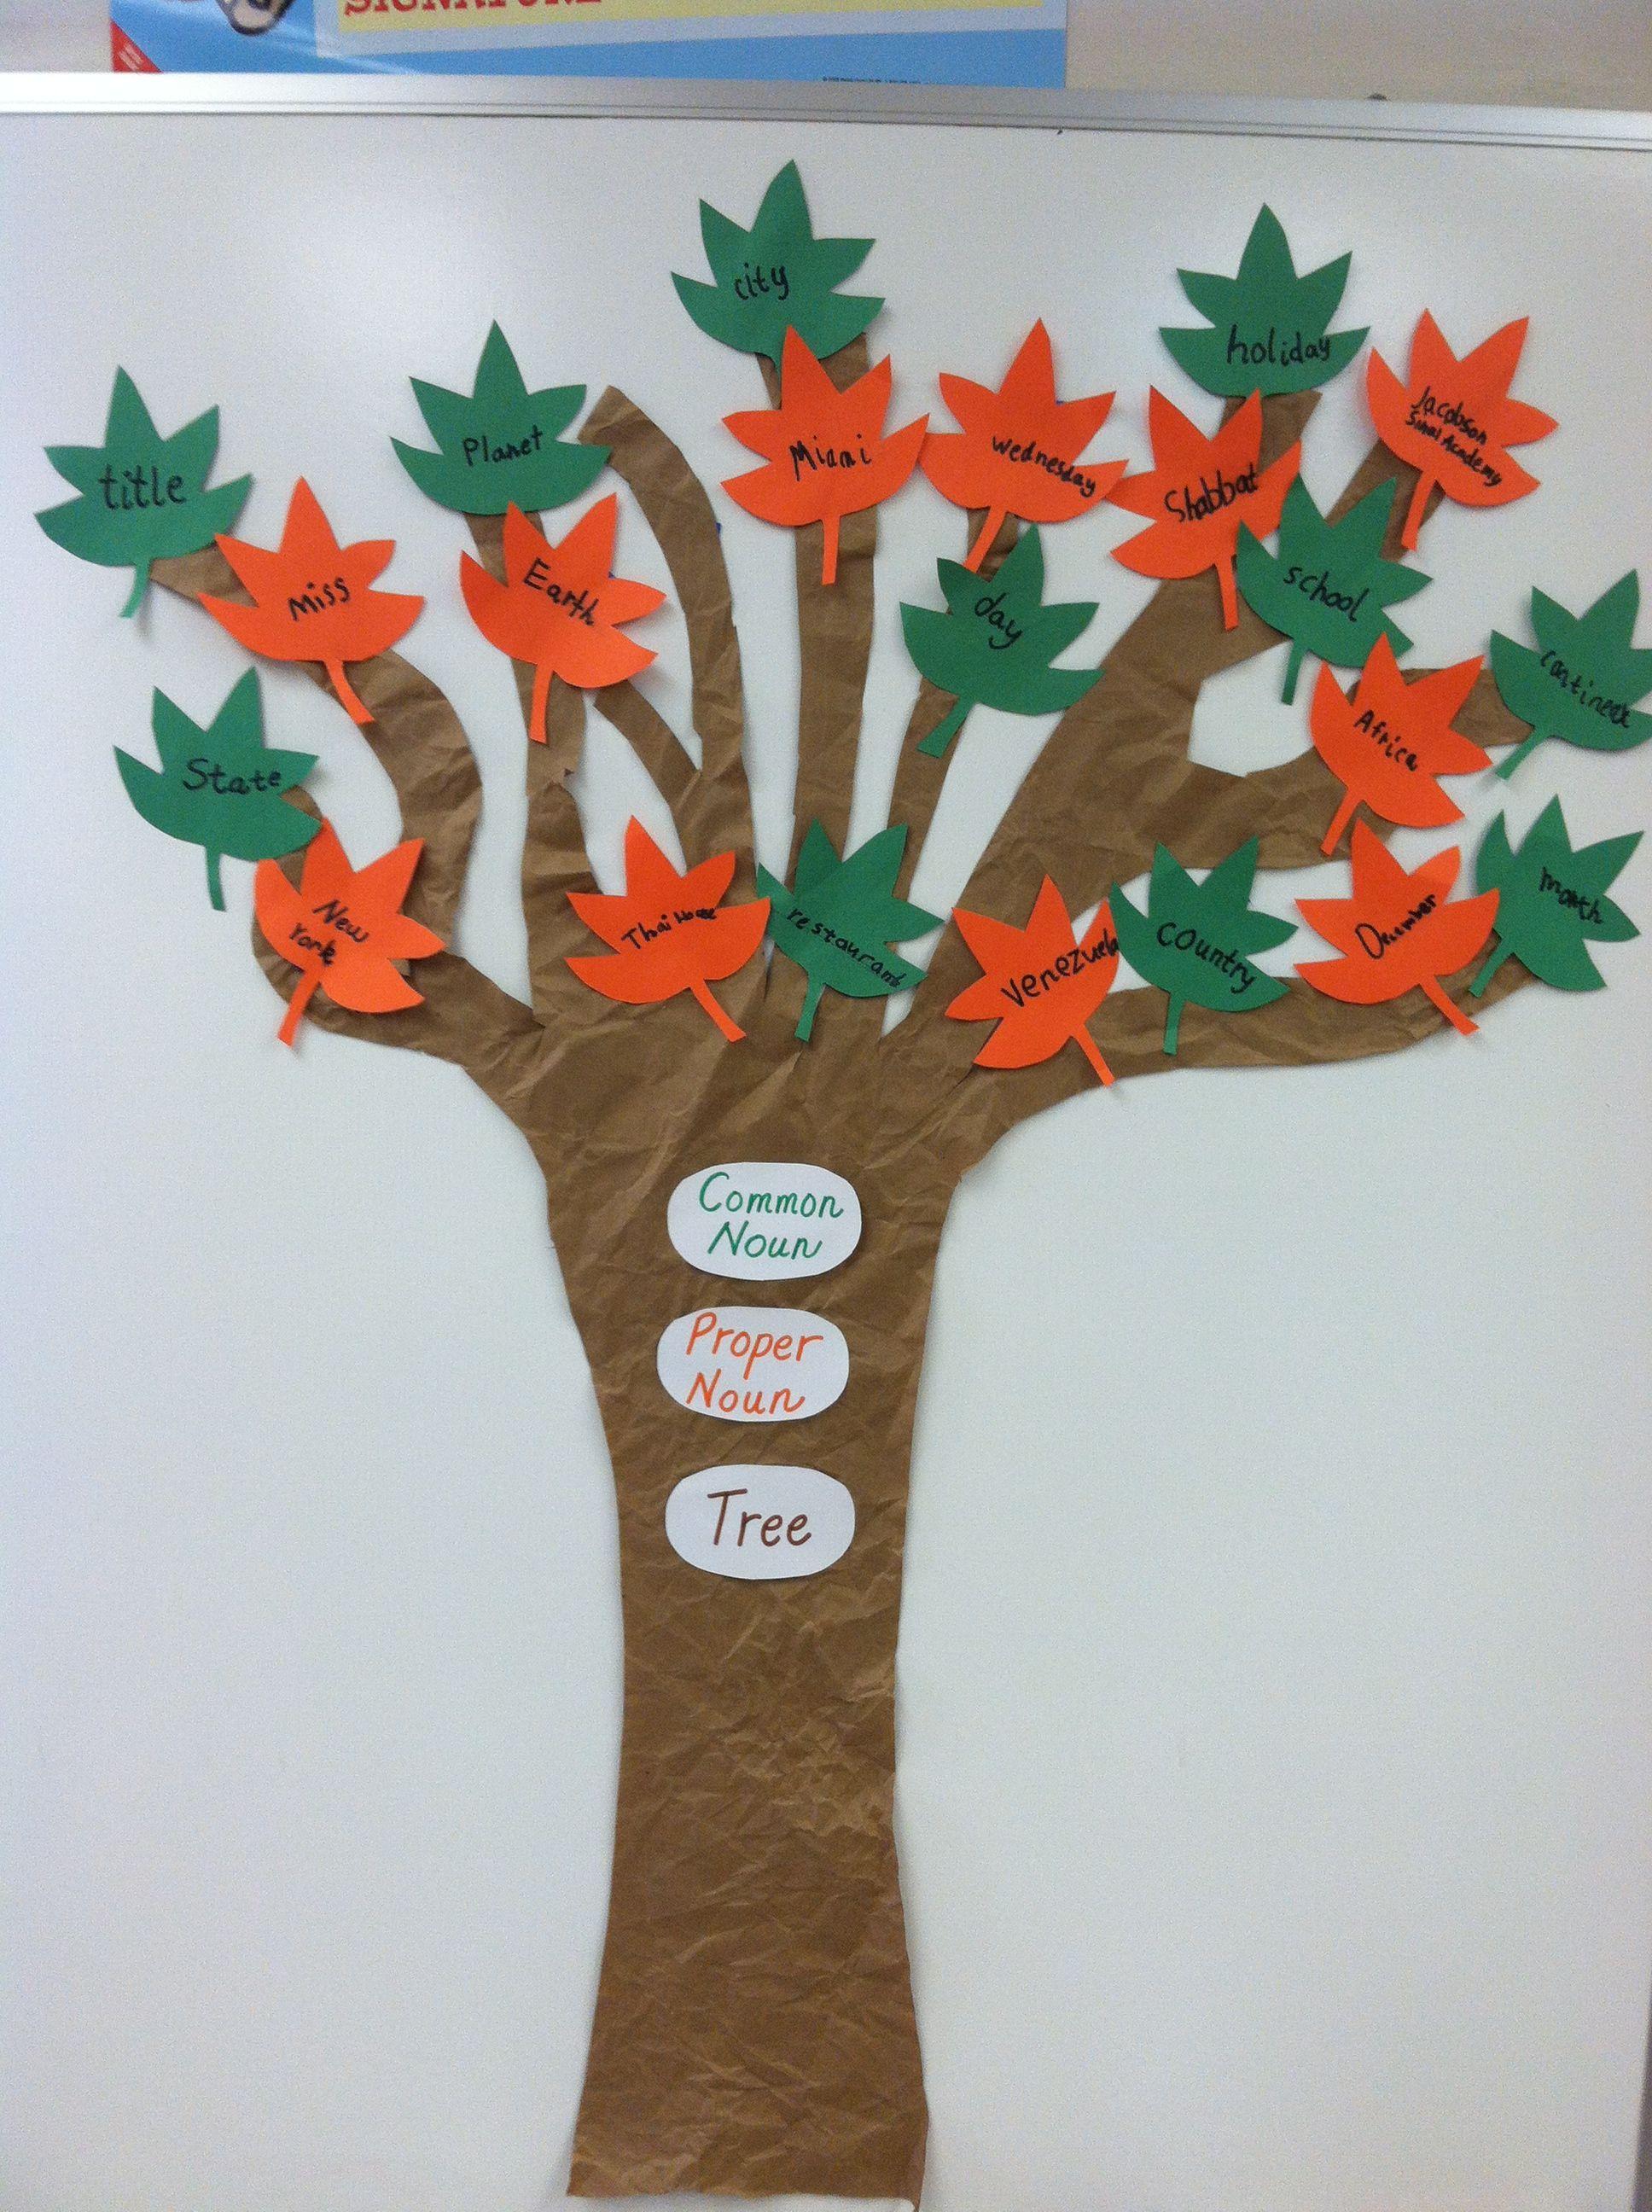 Common noun/Proper noun tree Common nouns, Nouns